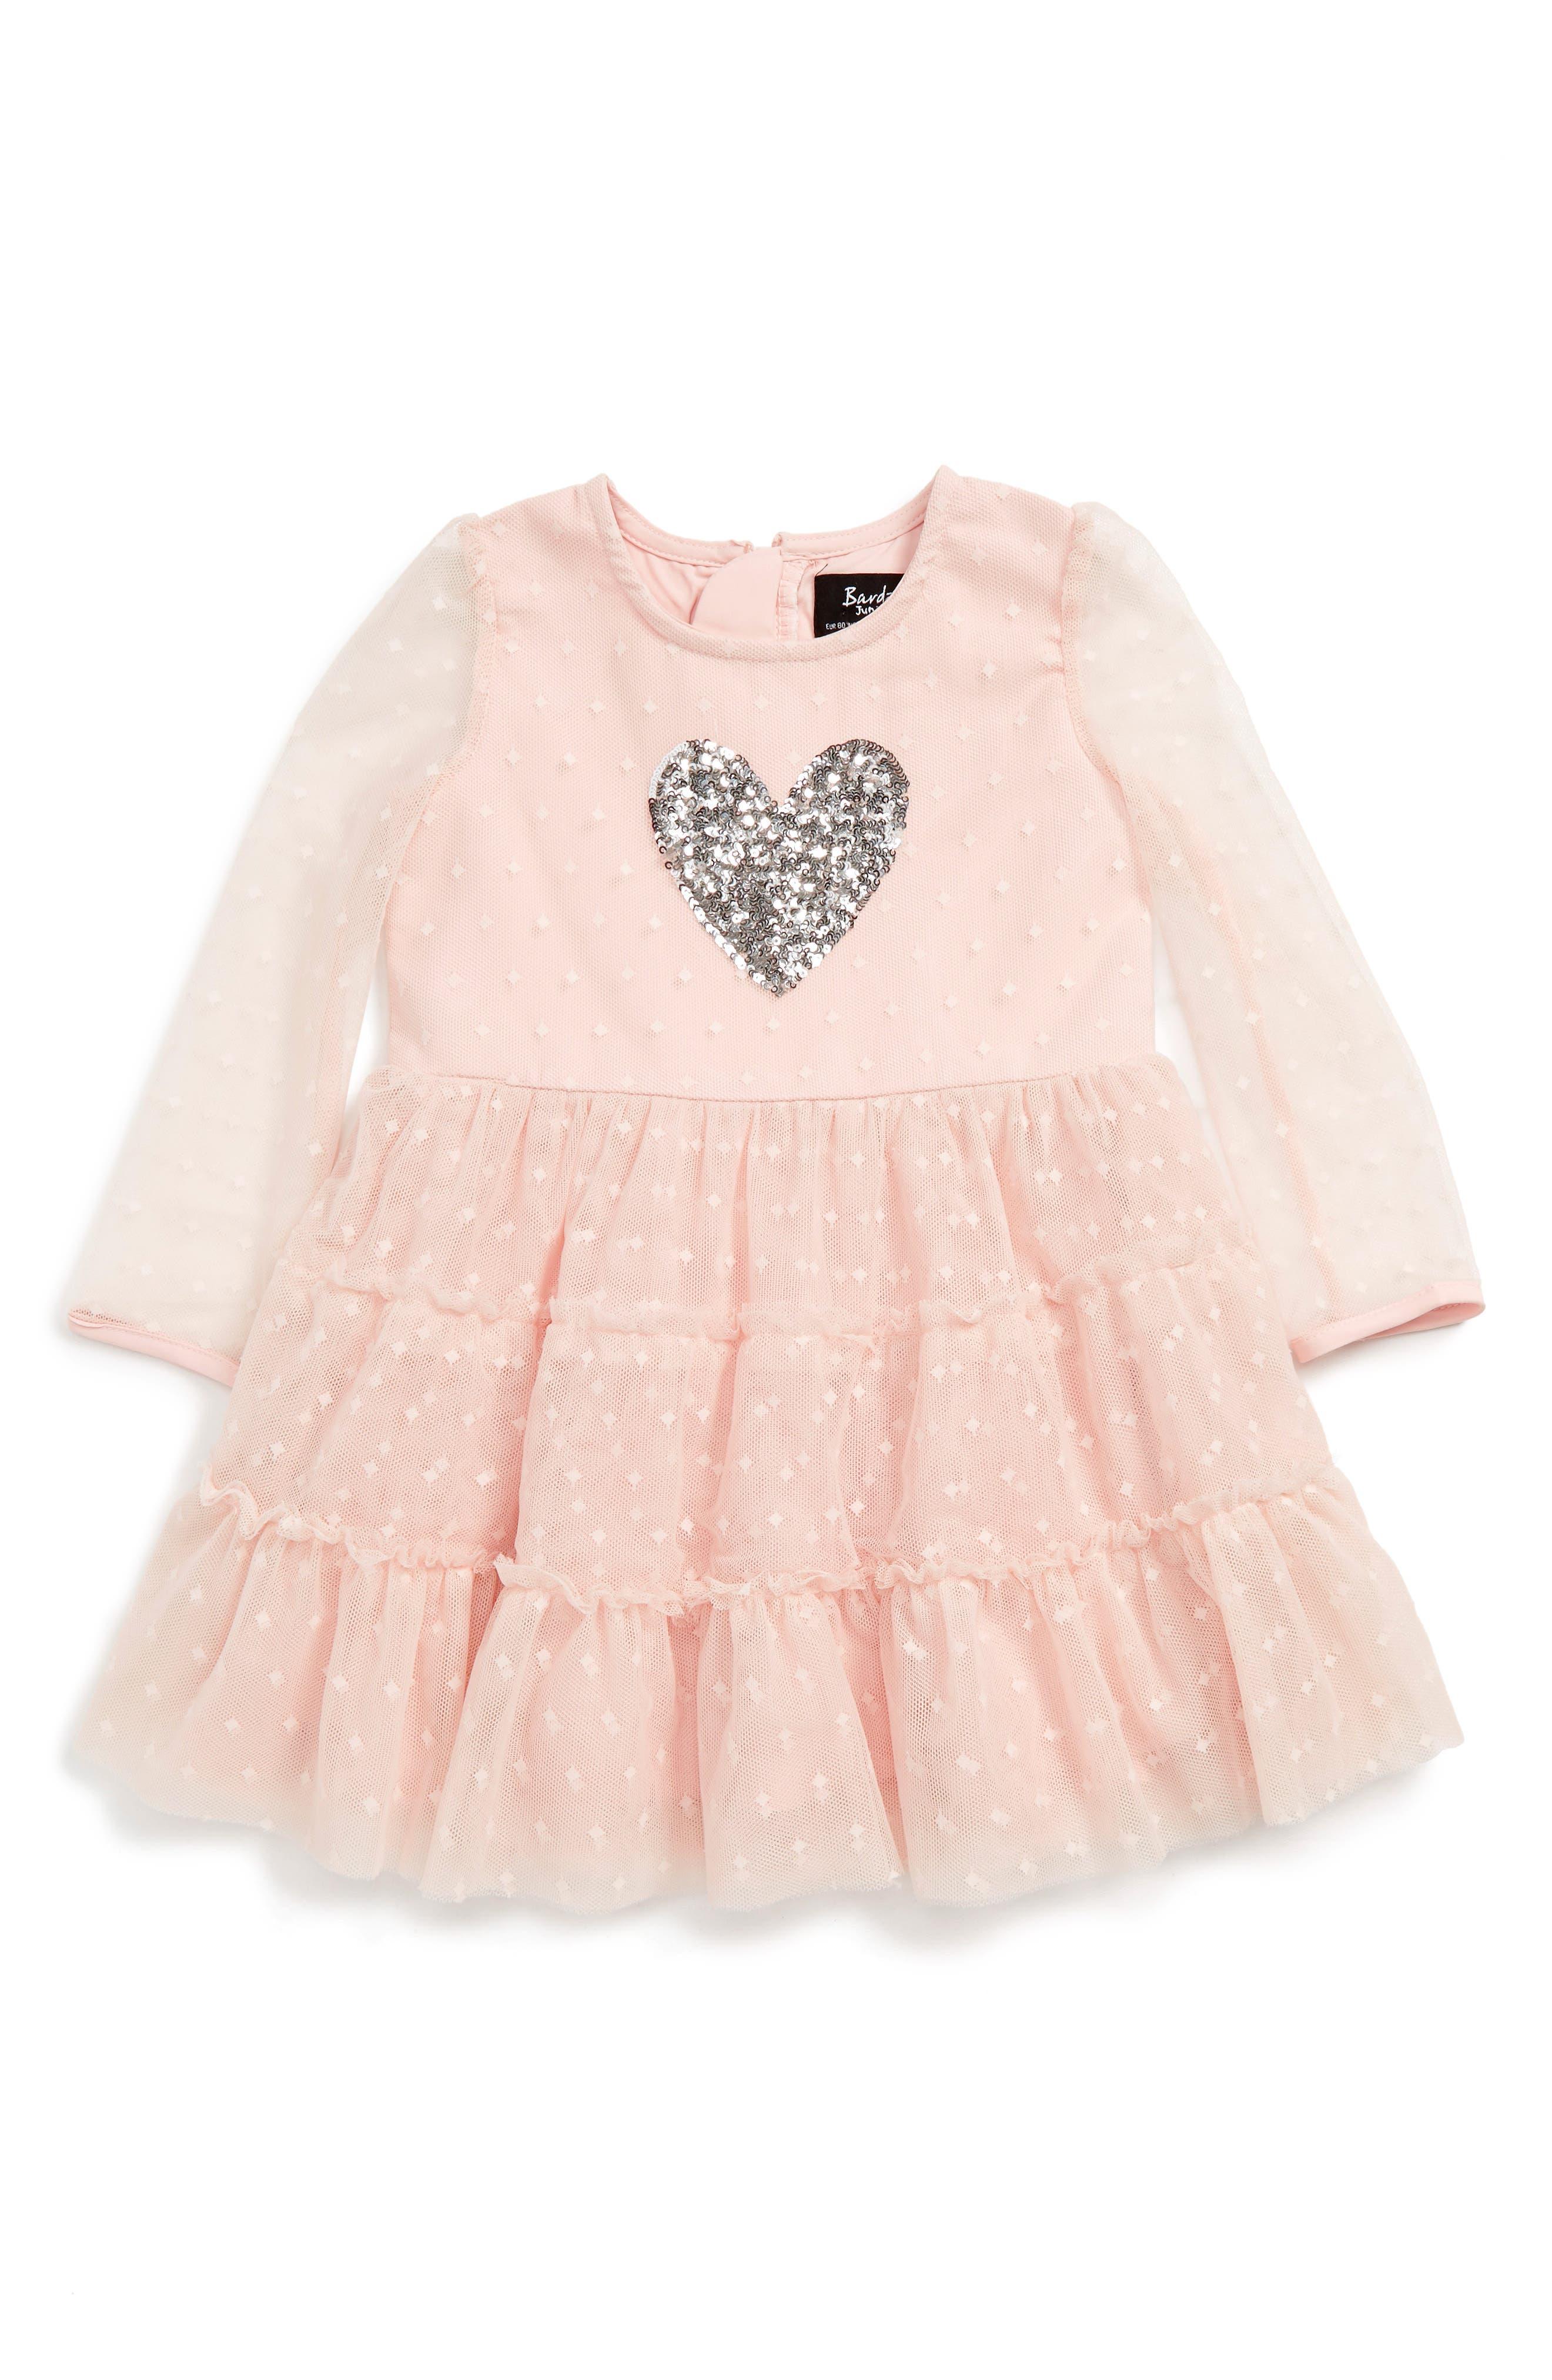 BARDOT JUNIOR Sequin Heart Dress